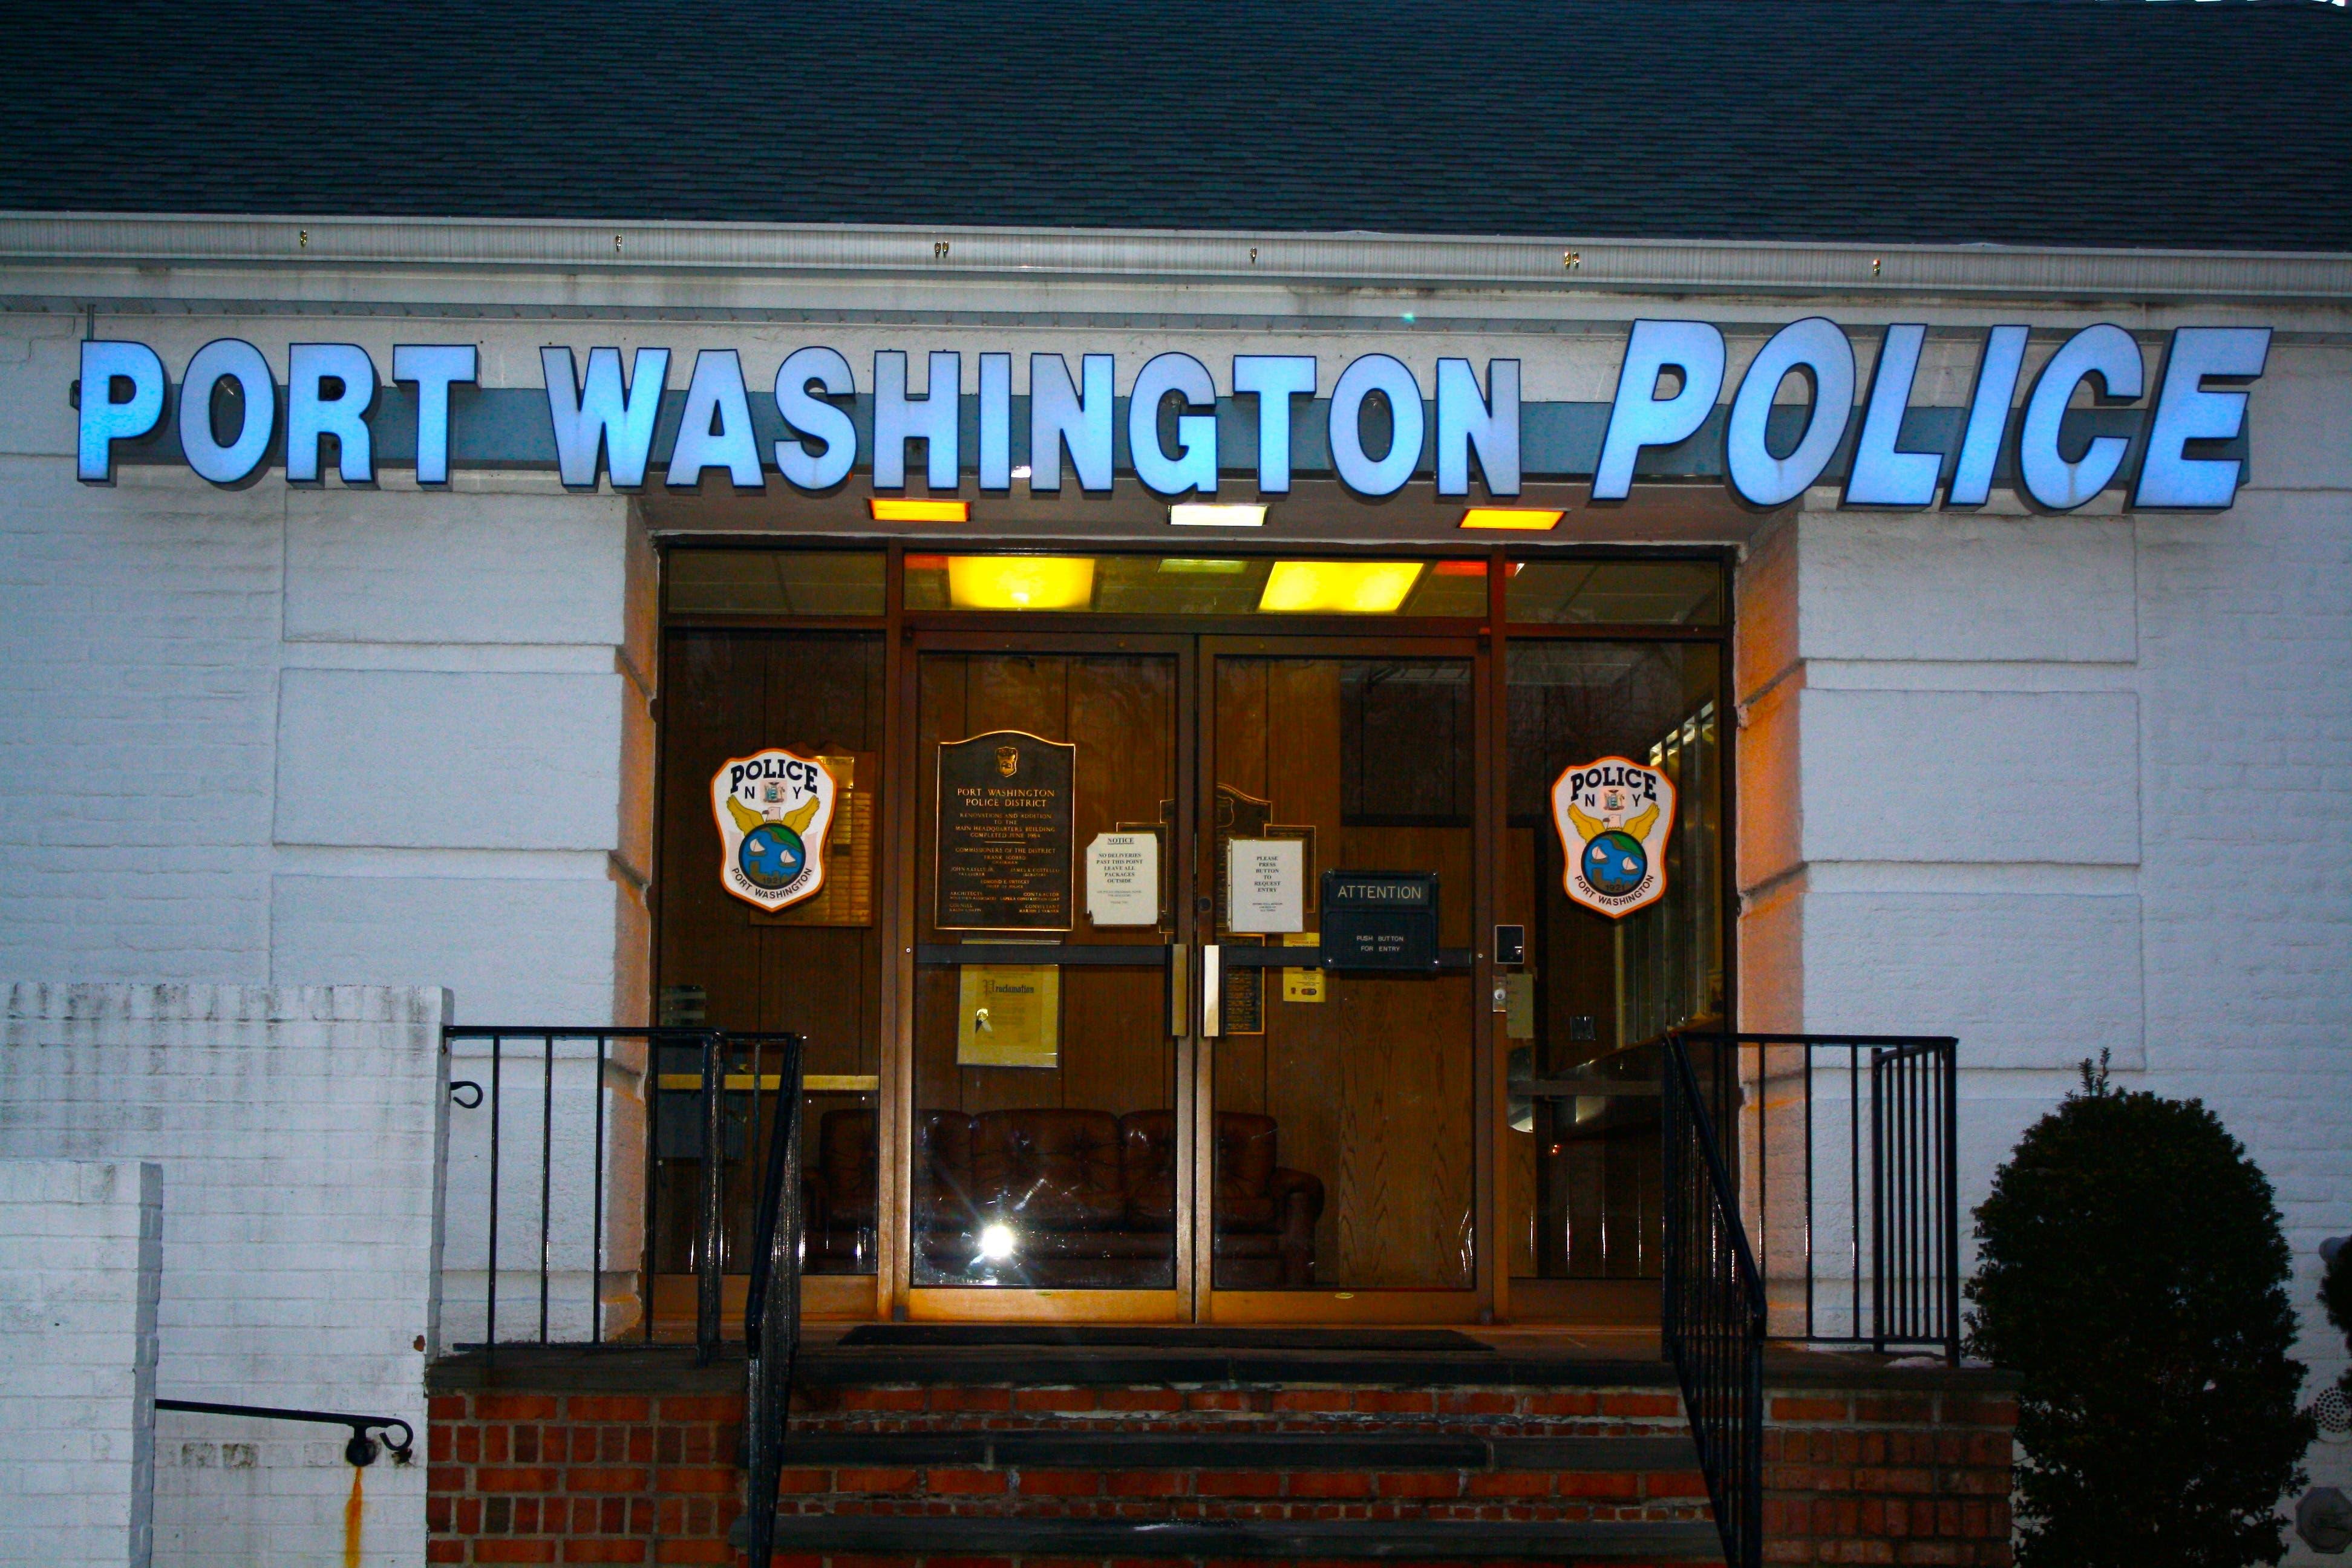 Port Washington Police: 'Better Prepared' to Respond to